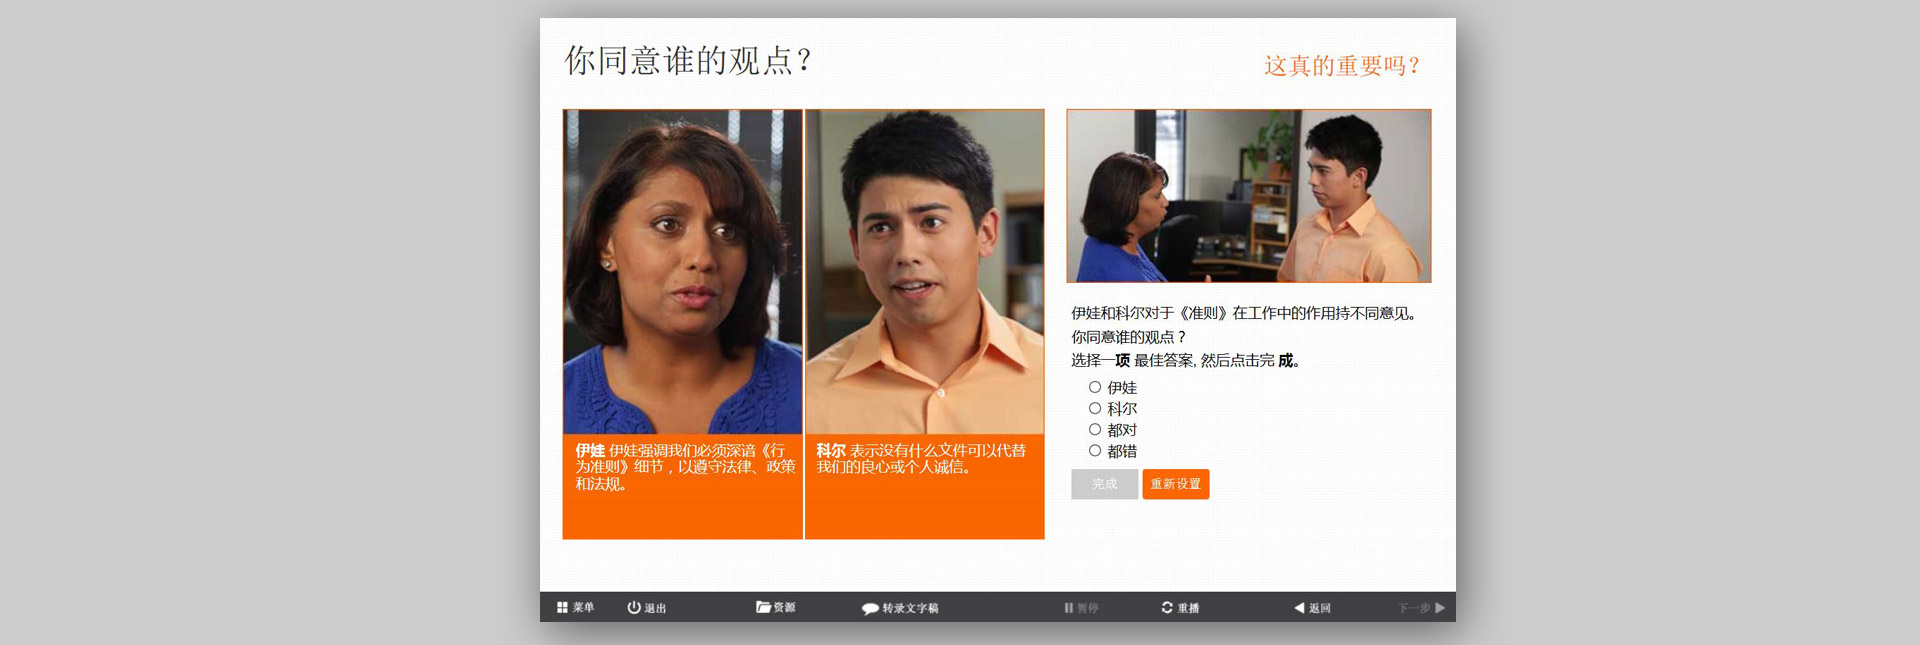 voice translation services